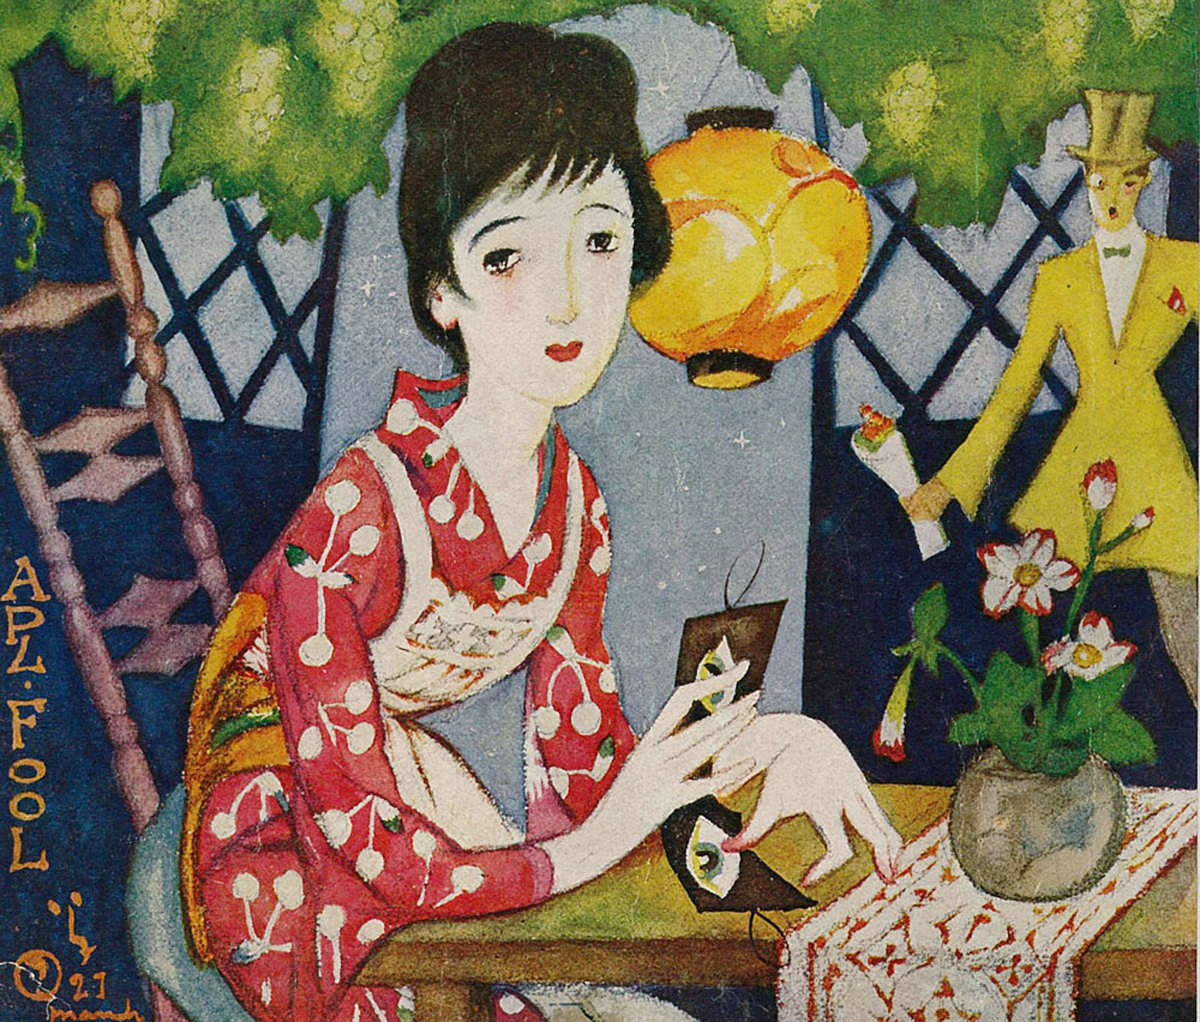 竹久夢二「APL・FOOL」 大正15年(1926)